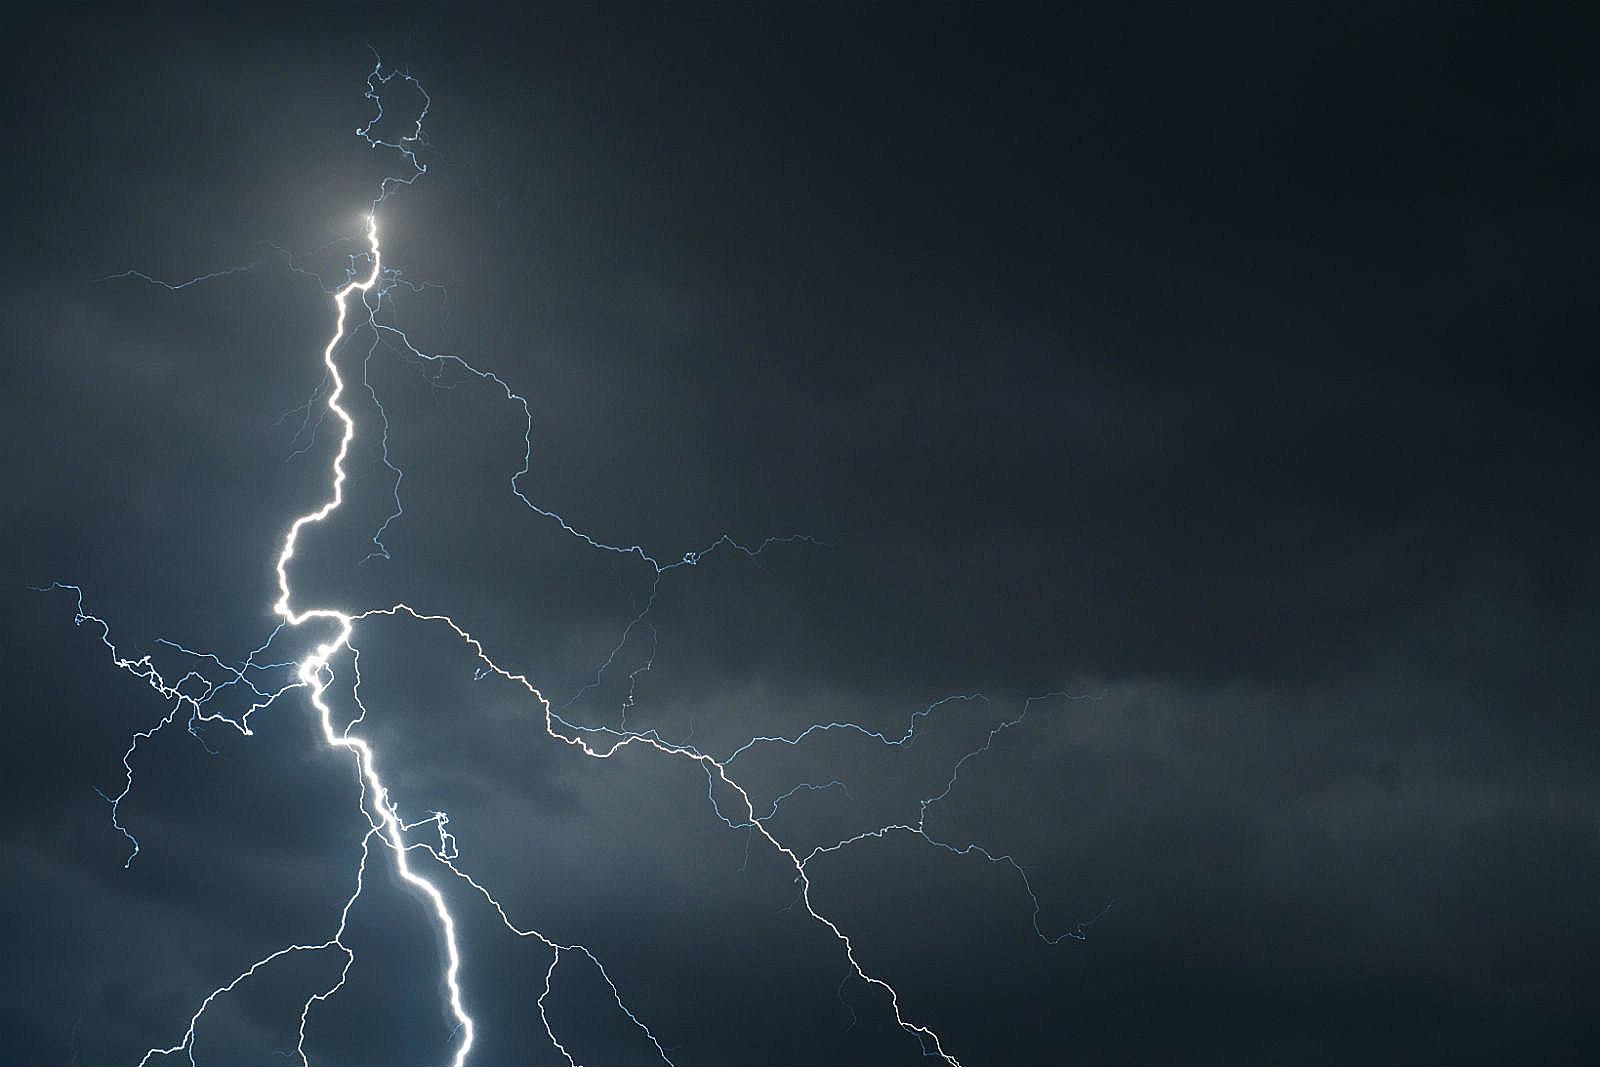 Cheyenne Weather Service: Monday Lightning Poses Fire Danger | KGAB